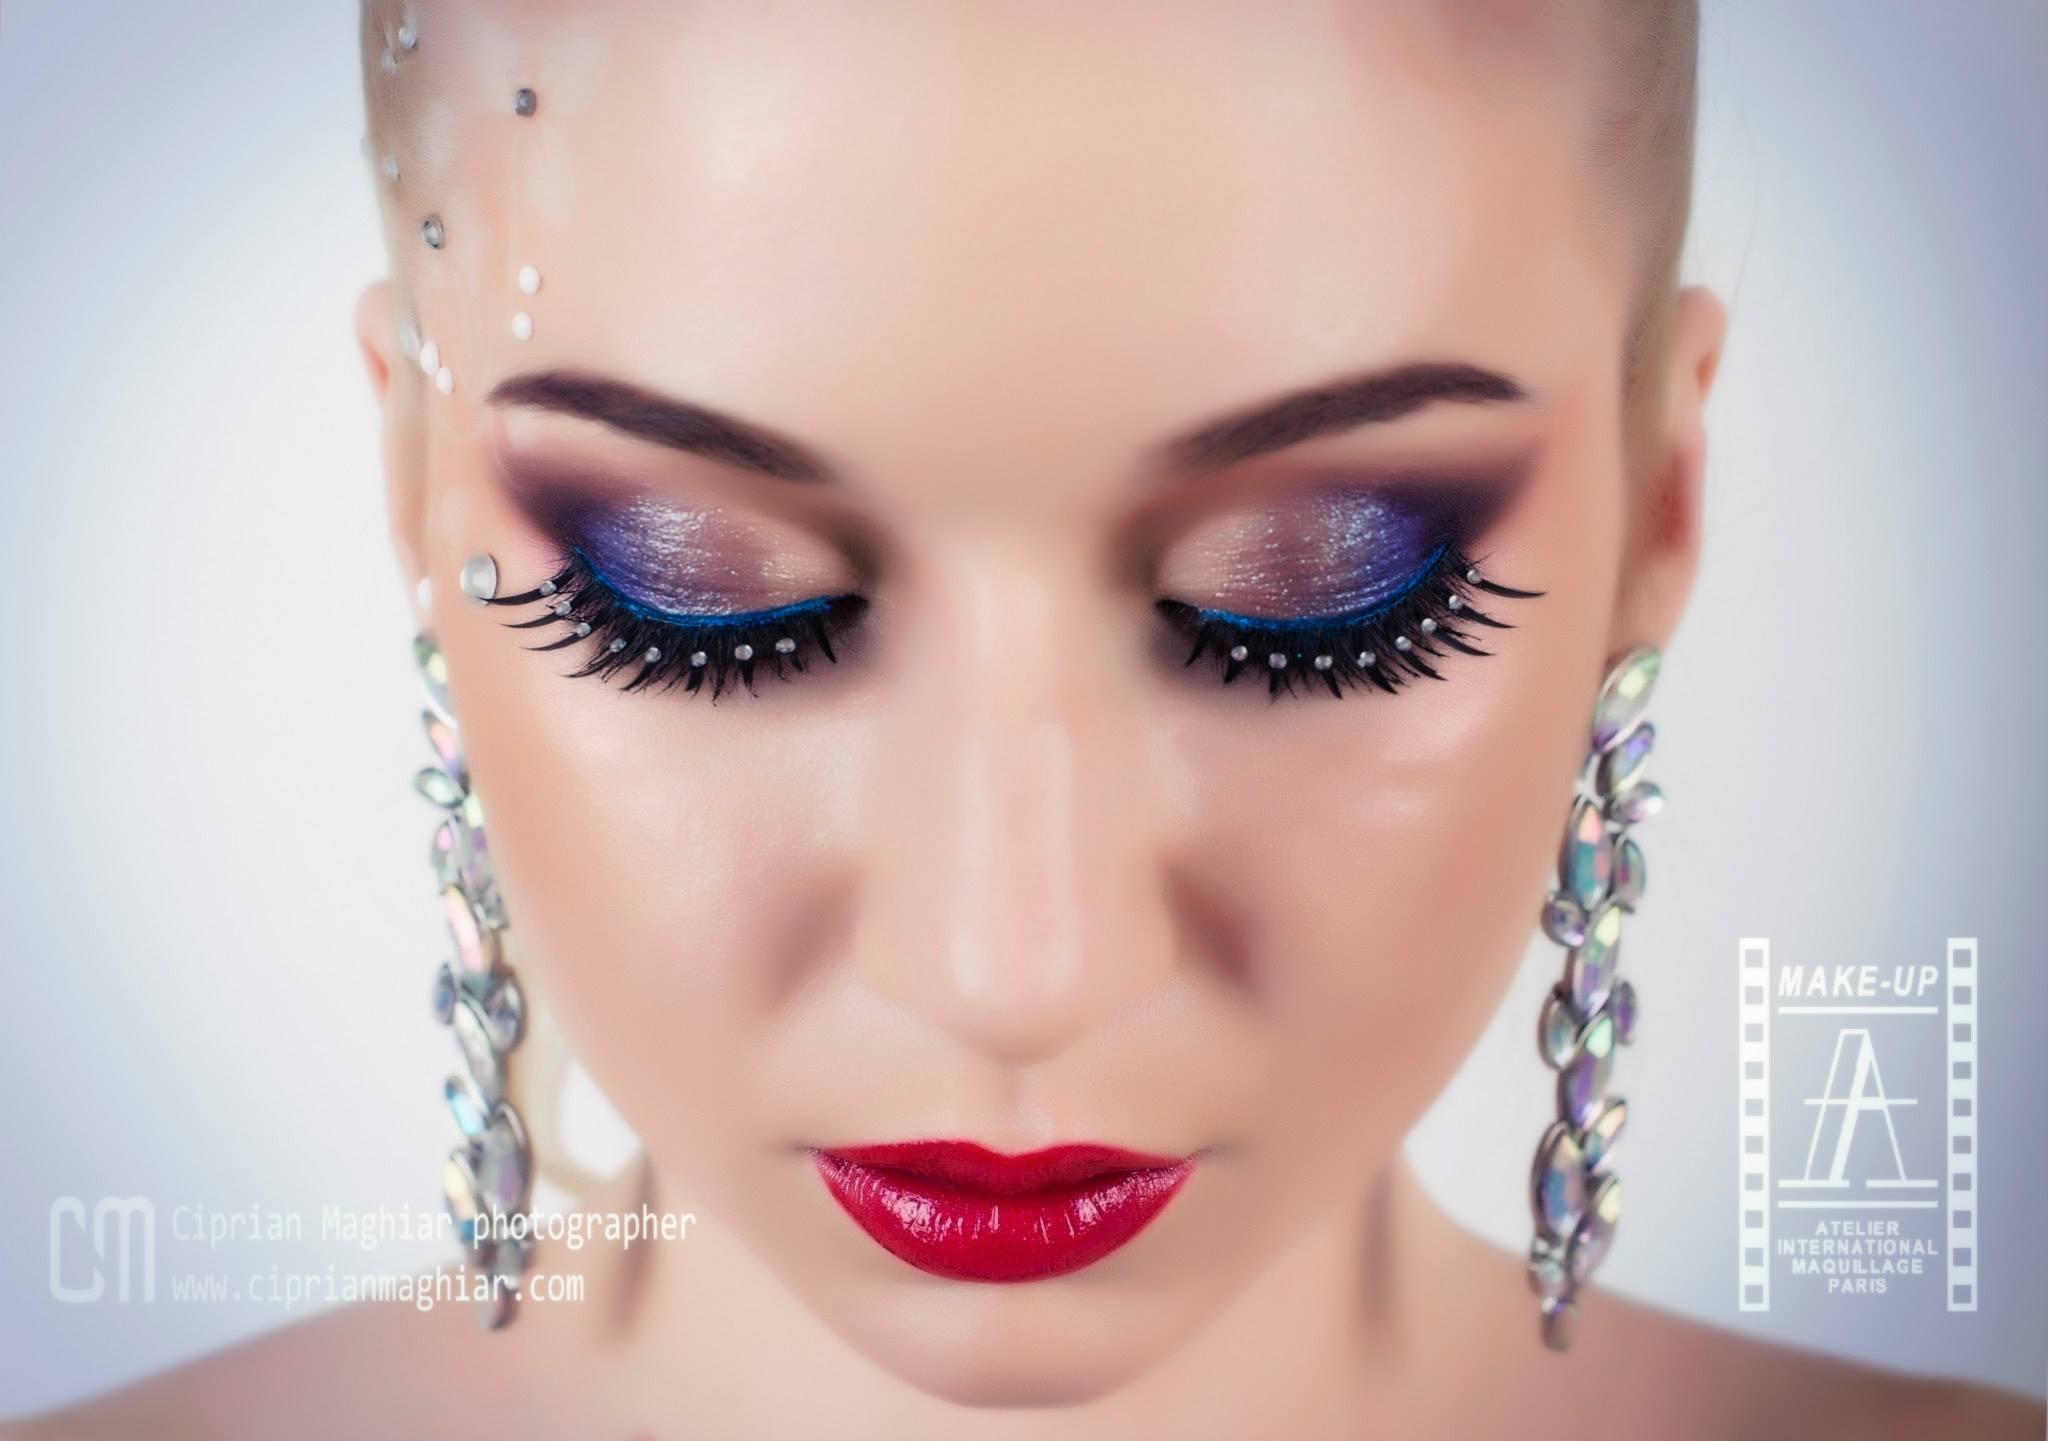 Nye Make Up Proposal Personal Blog By Alina Boda